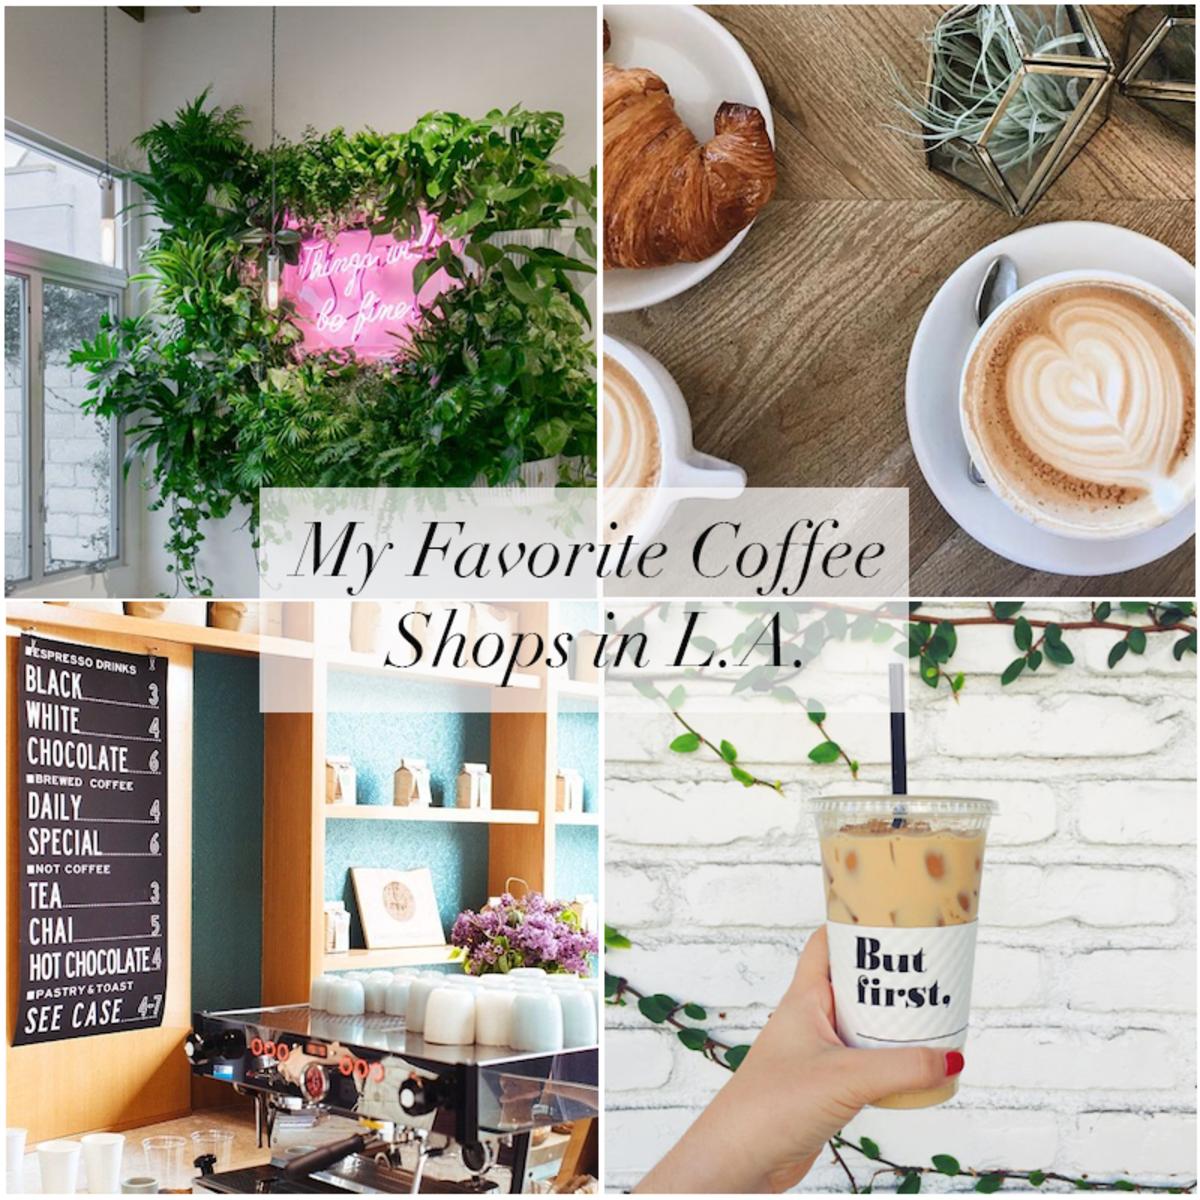 My favorite coffee shops in LA.png